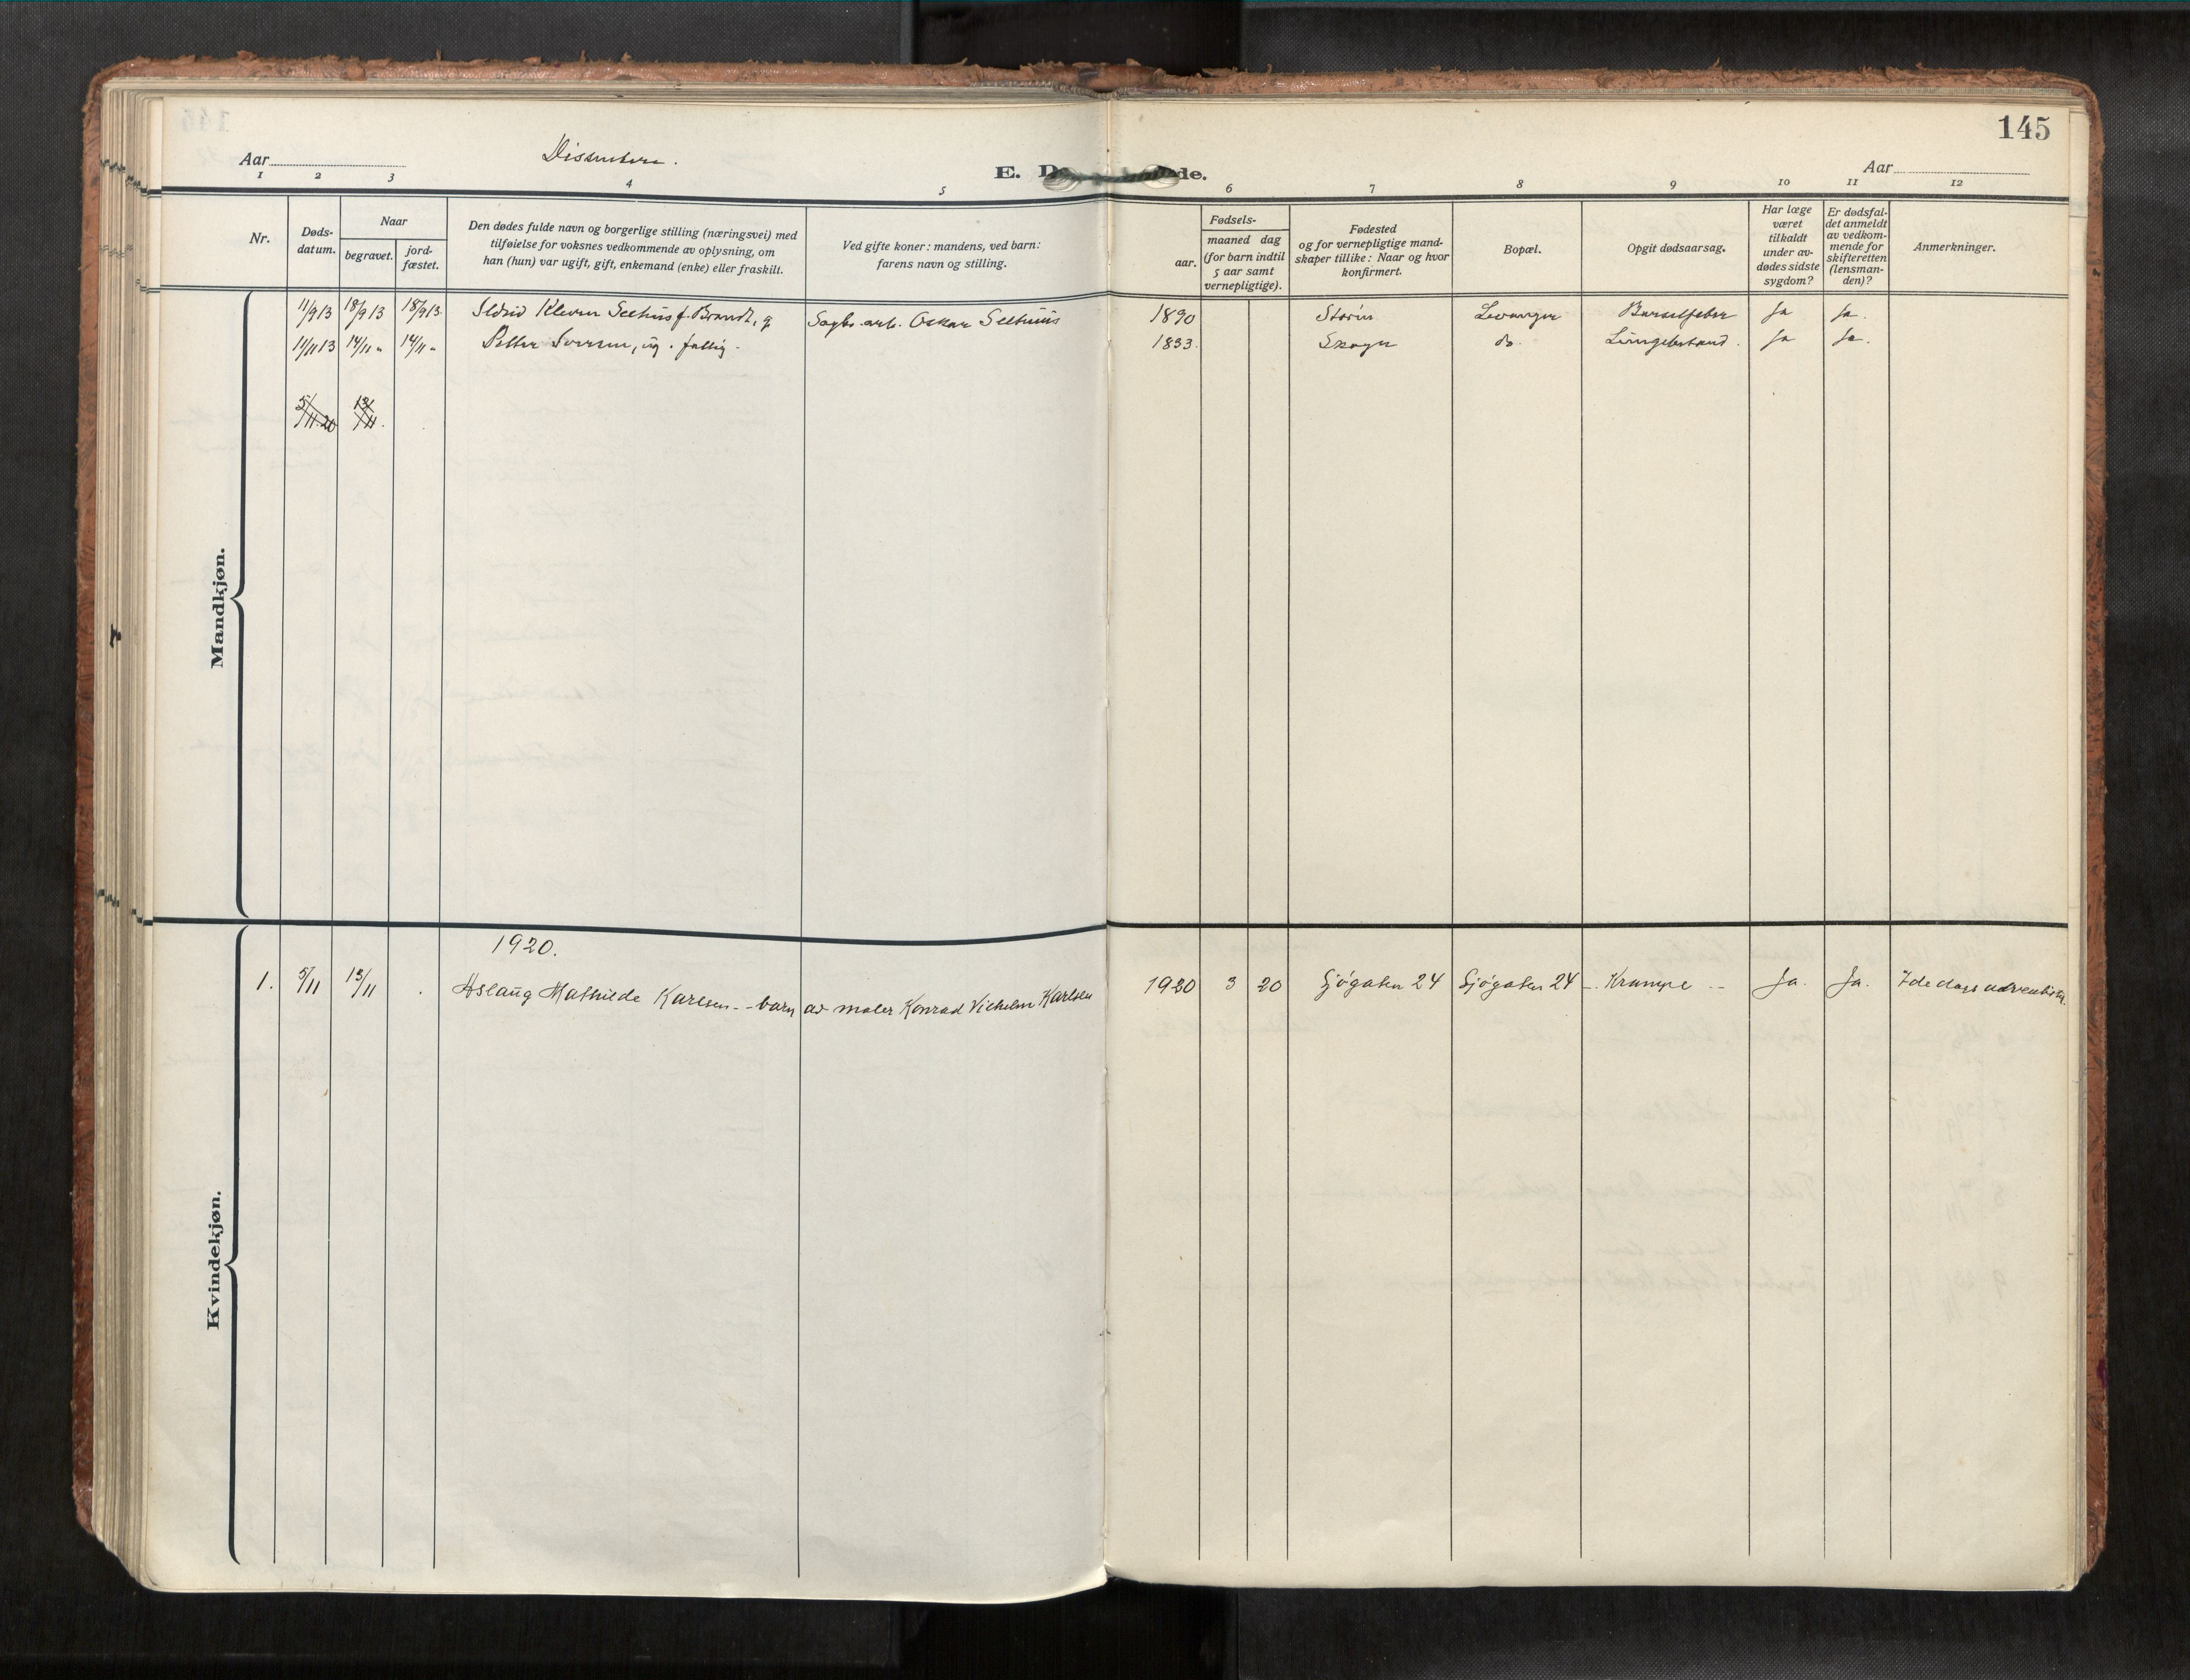 SAT, Levanger sokneprestkontor*, Parish register (official) no. 1, 1912-1932, p. 145